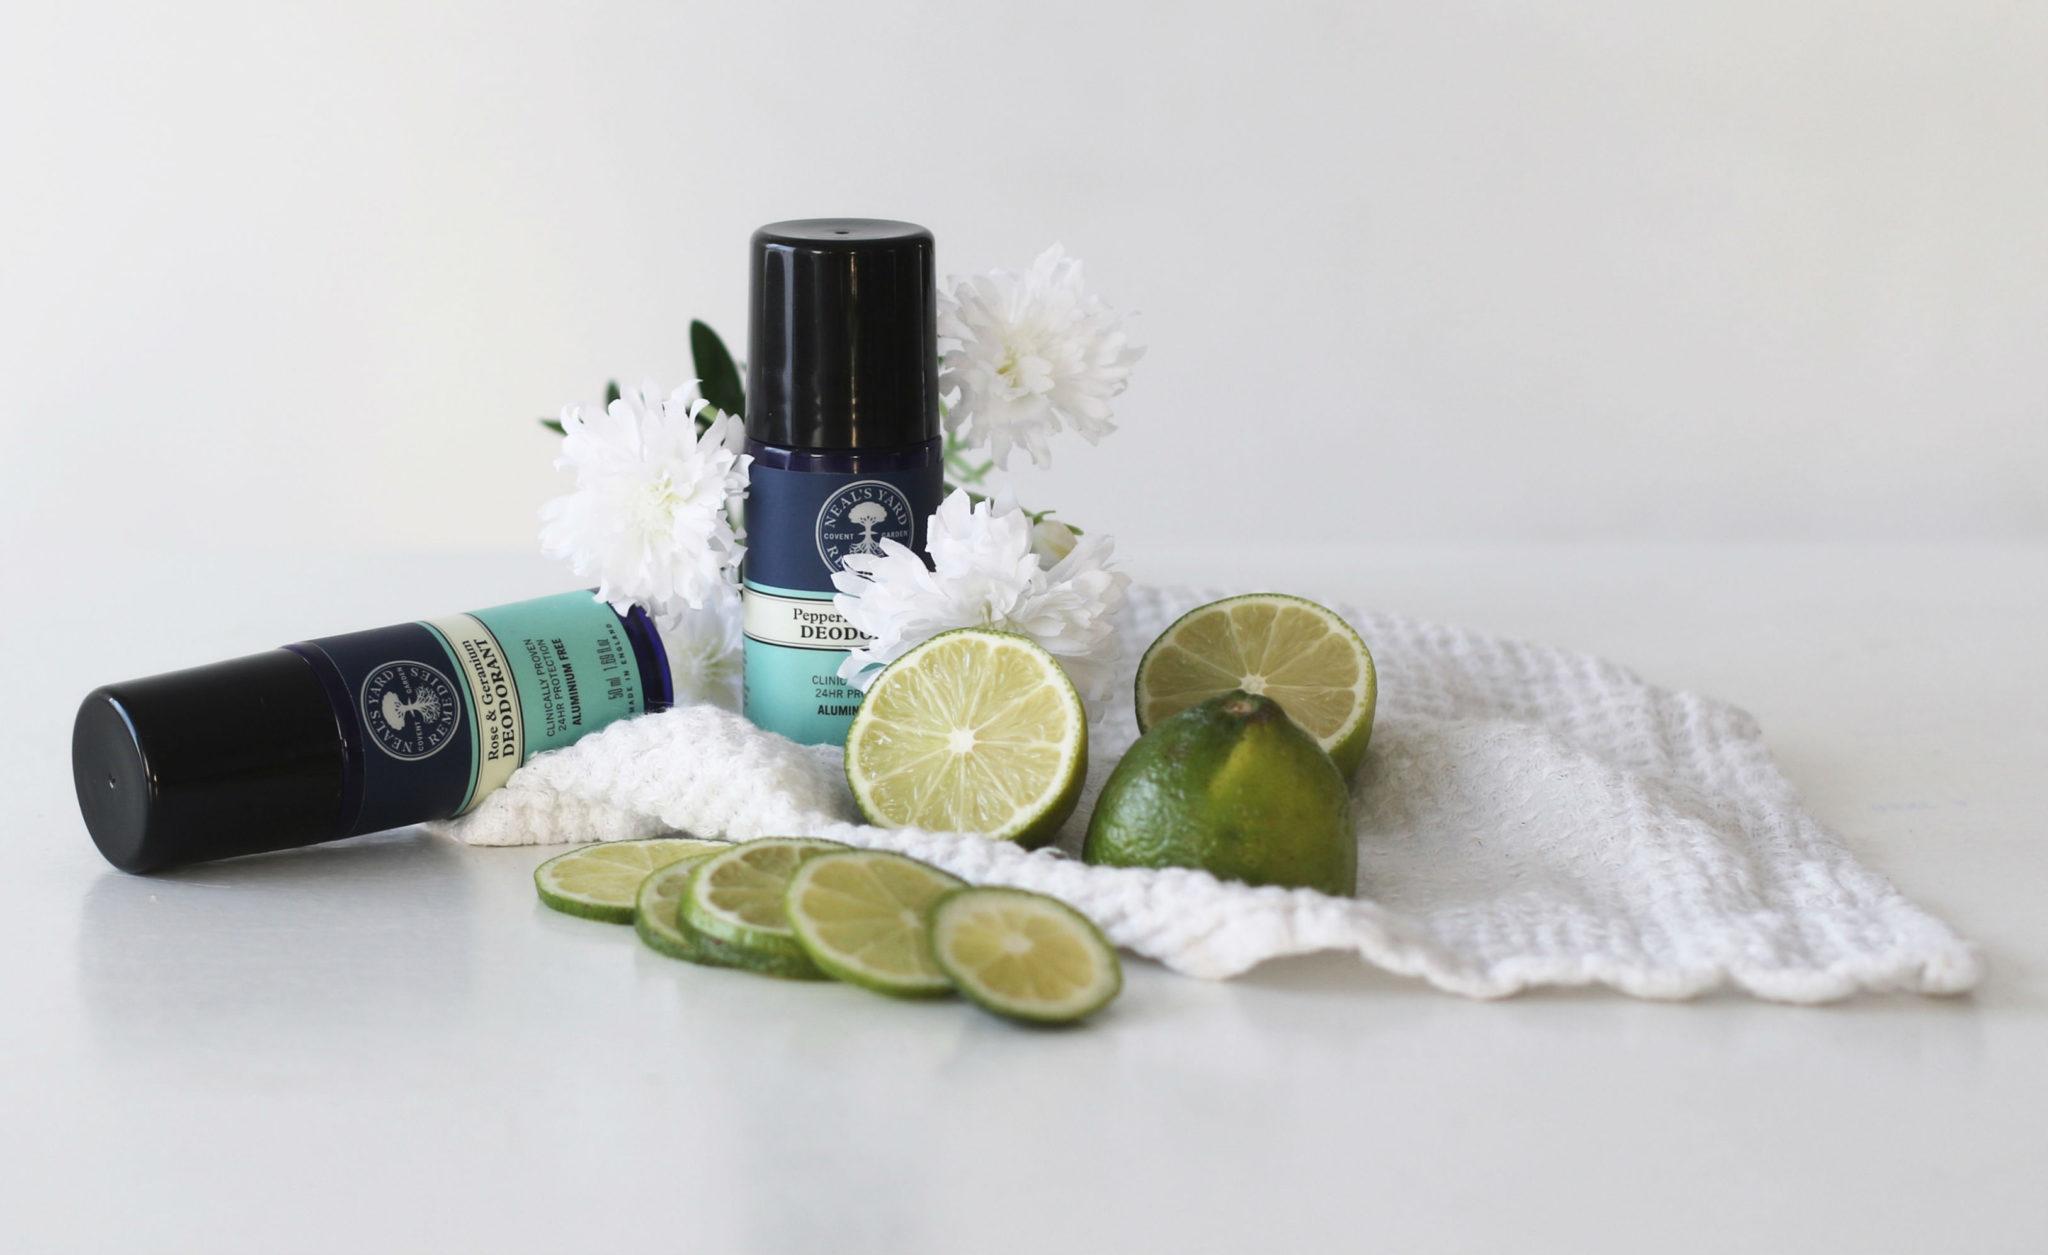 NYR Peppermint & Lime – Rose & Geranium